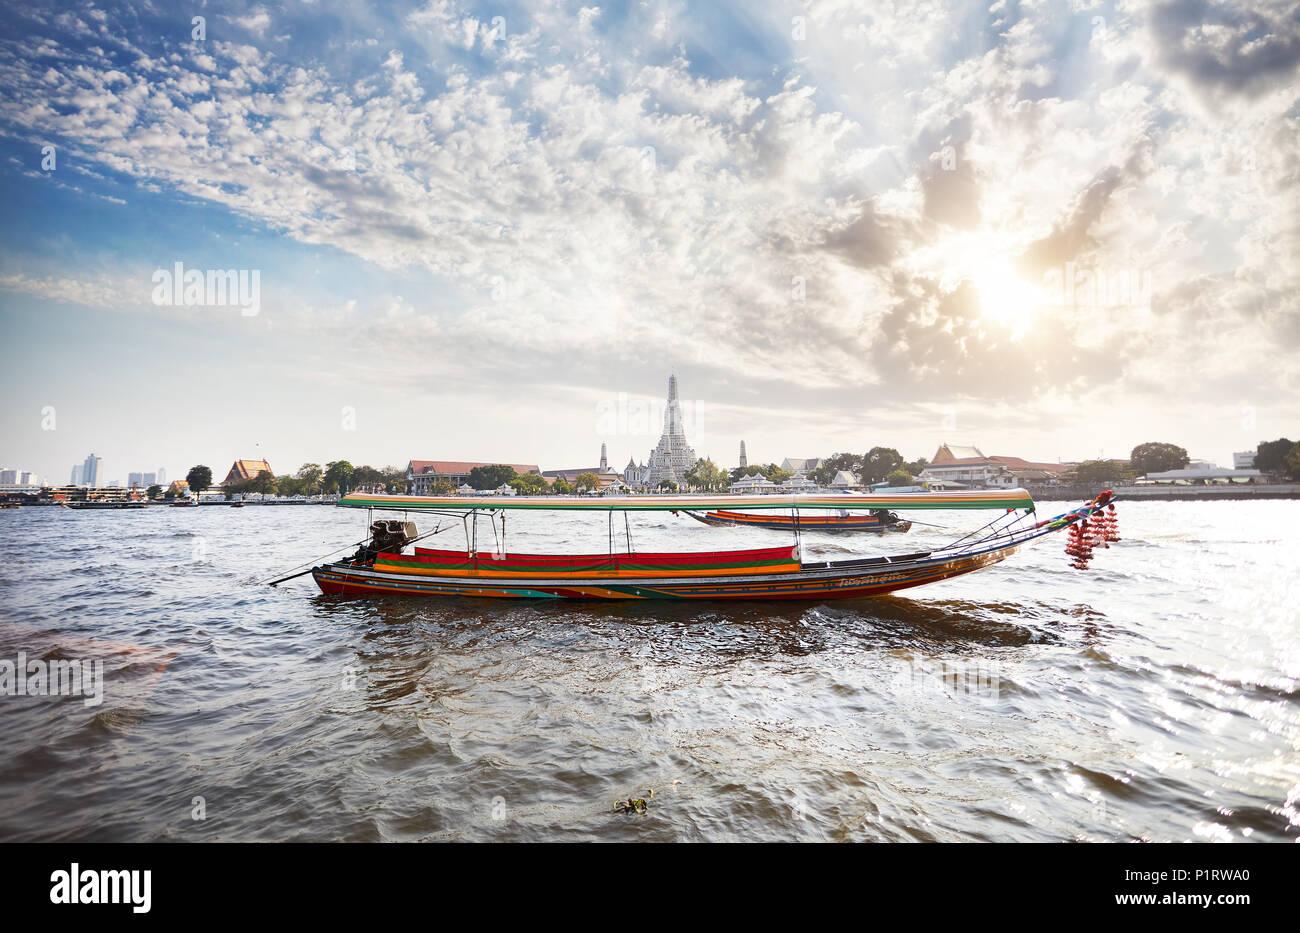 Traditional Thai Long tail boat in Chao Phraya river near Wat Arun at sunset in Bangkok, Thailand - Stock Image